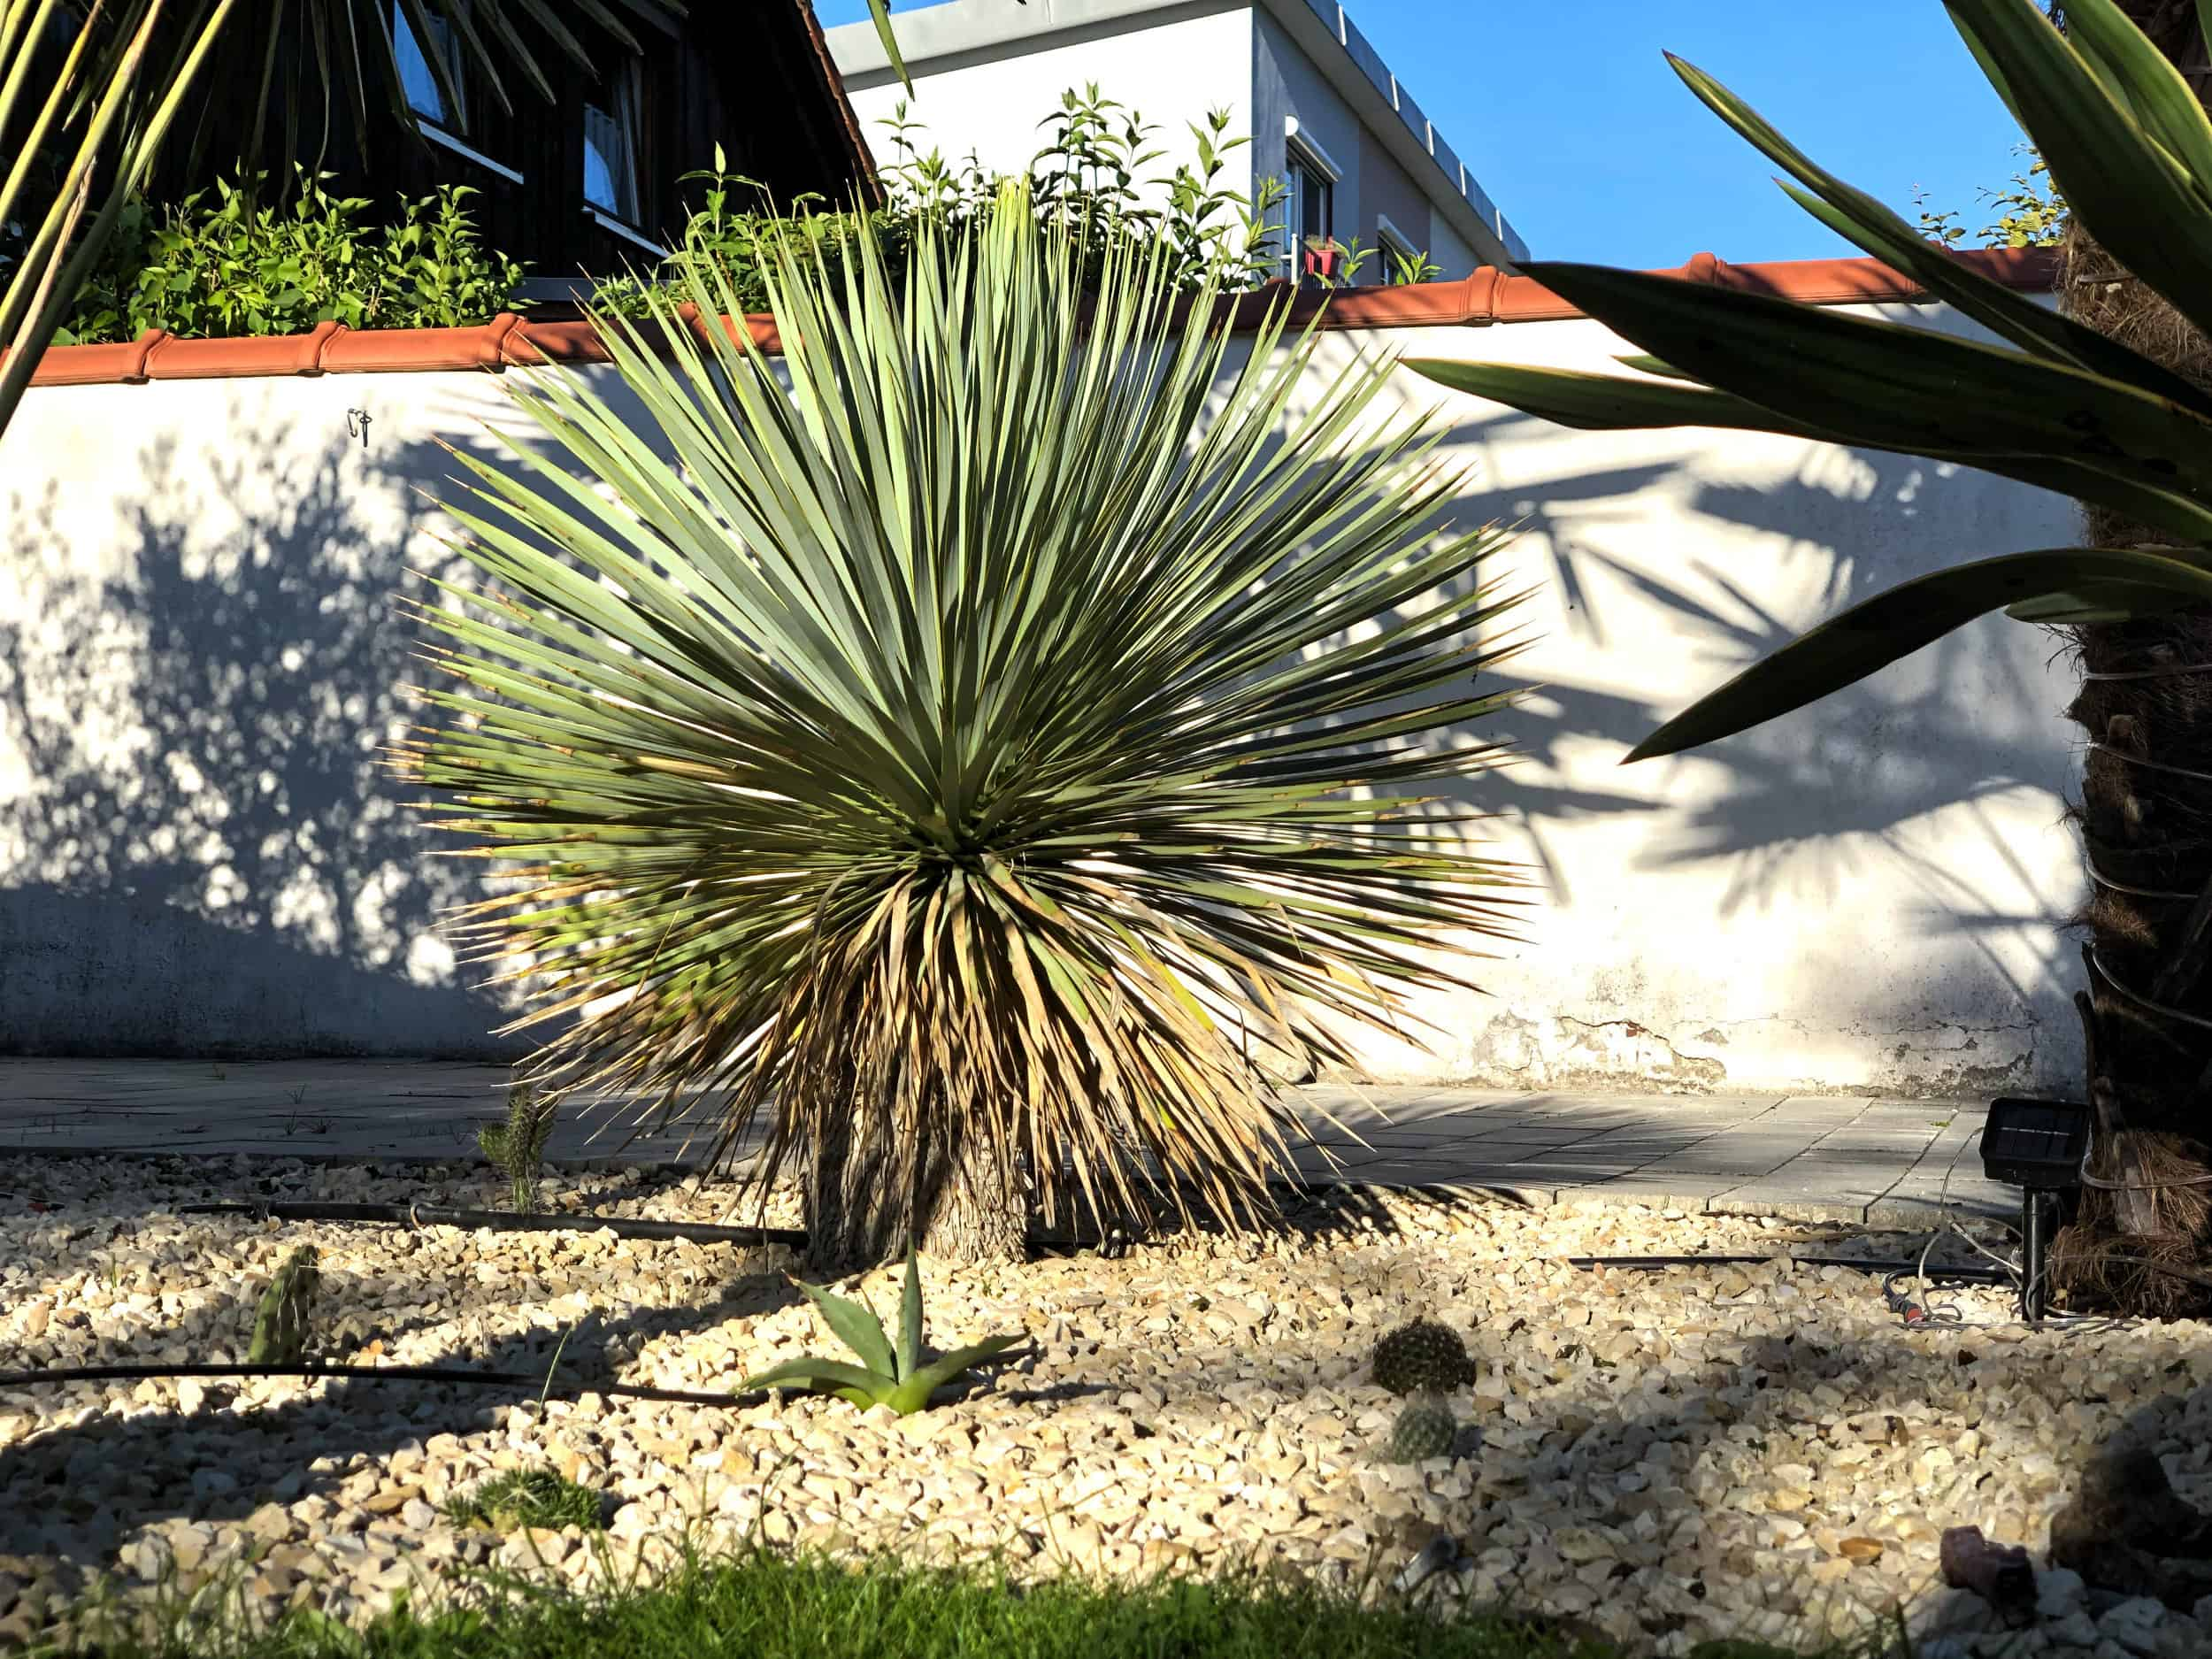 20-07-Yucca rostrata 01